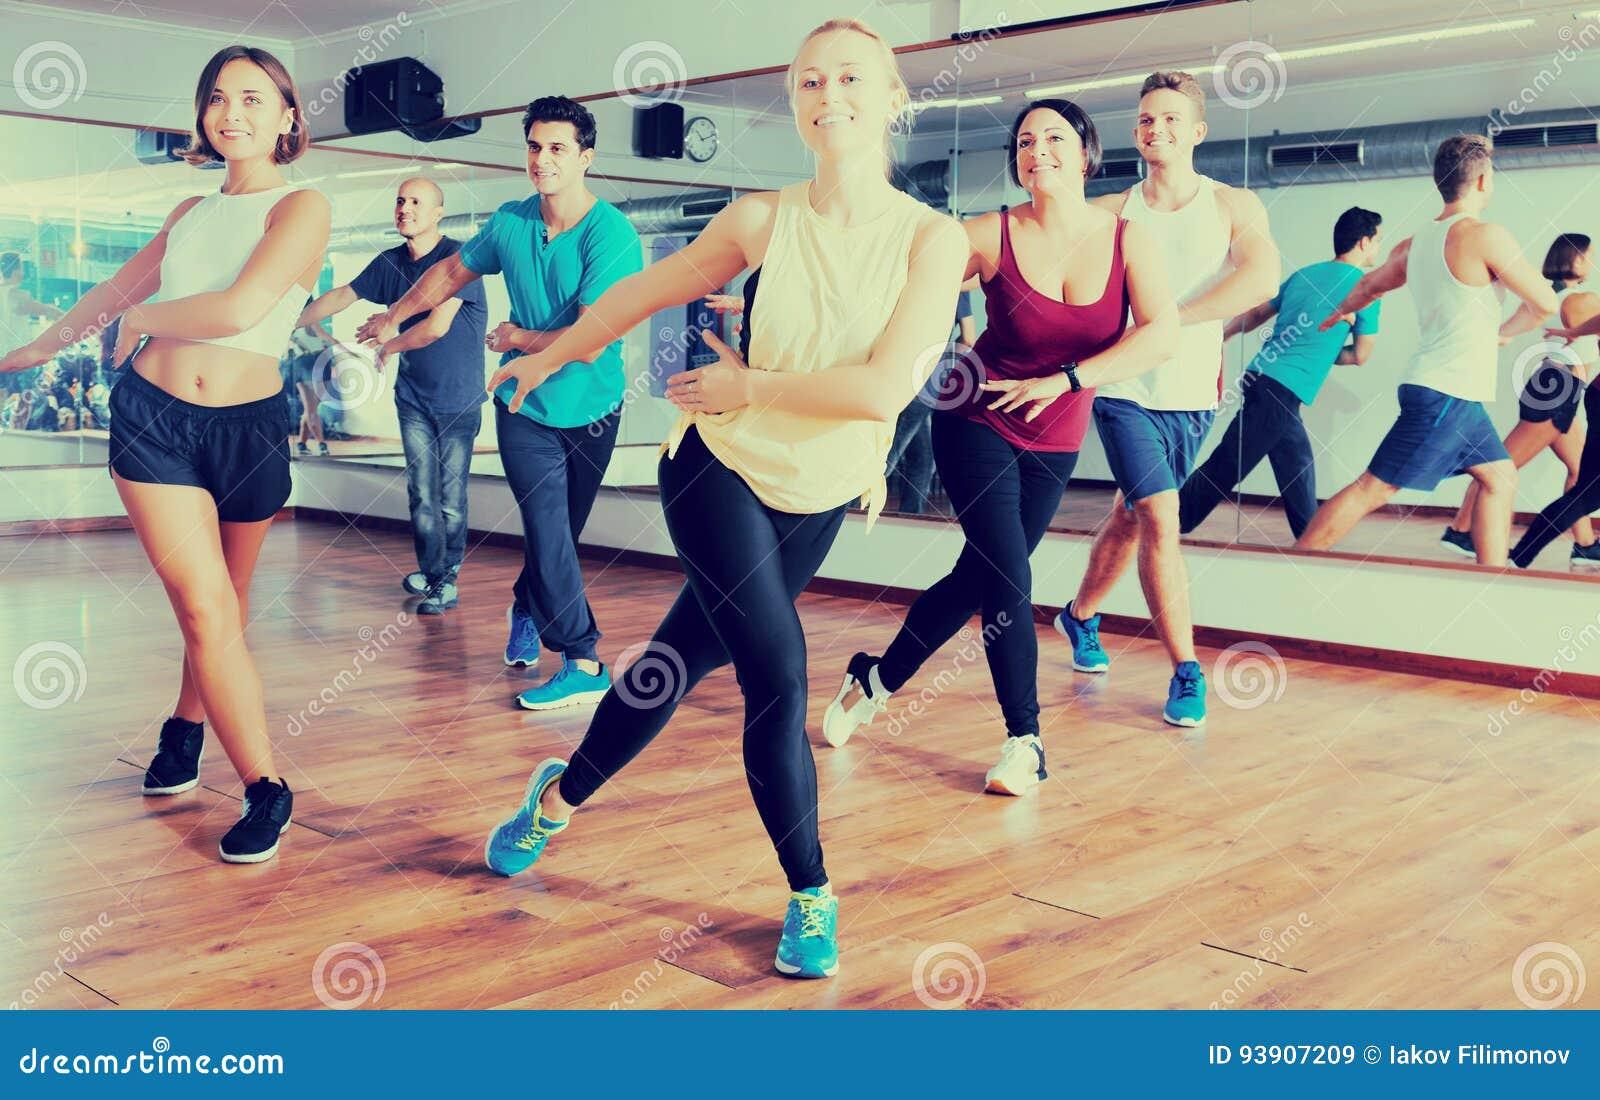 люди и дамы танцуя zumba